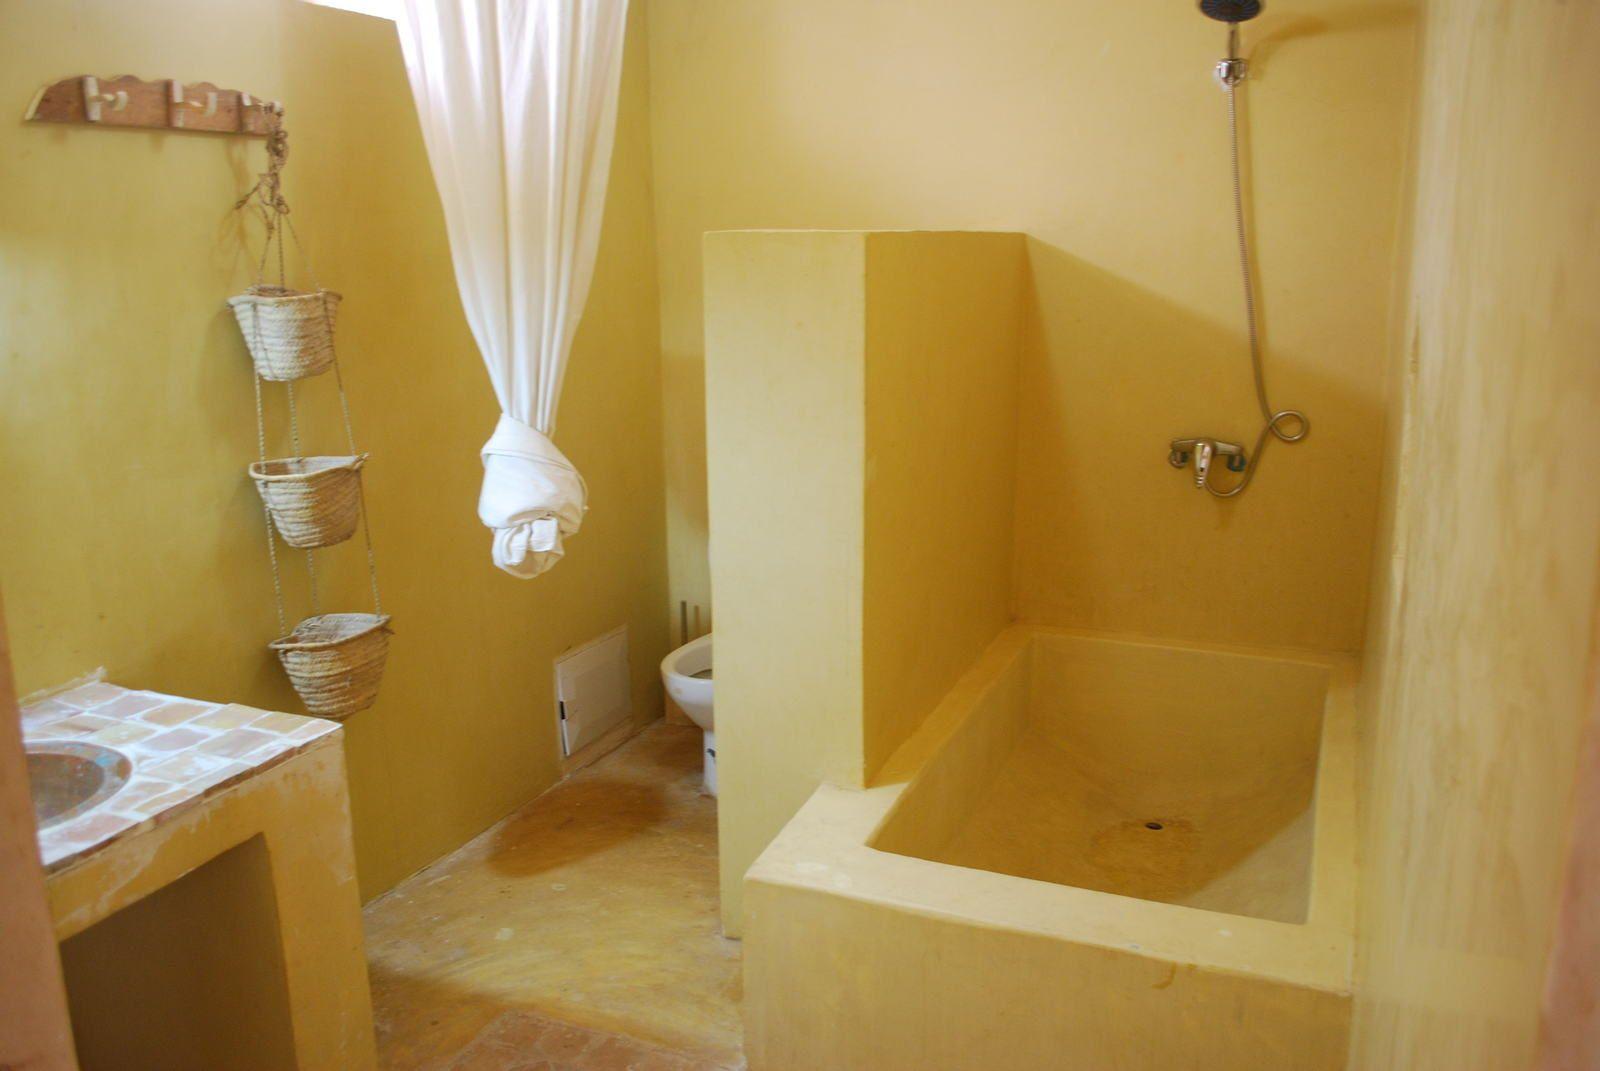 notre lieu d 39 h bergement au maroc l 39 esprit des sens essaouira je neetdefume je ne d fume. Black Bedroom Furniture Sets. Home Design Ideas